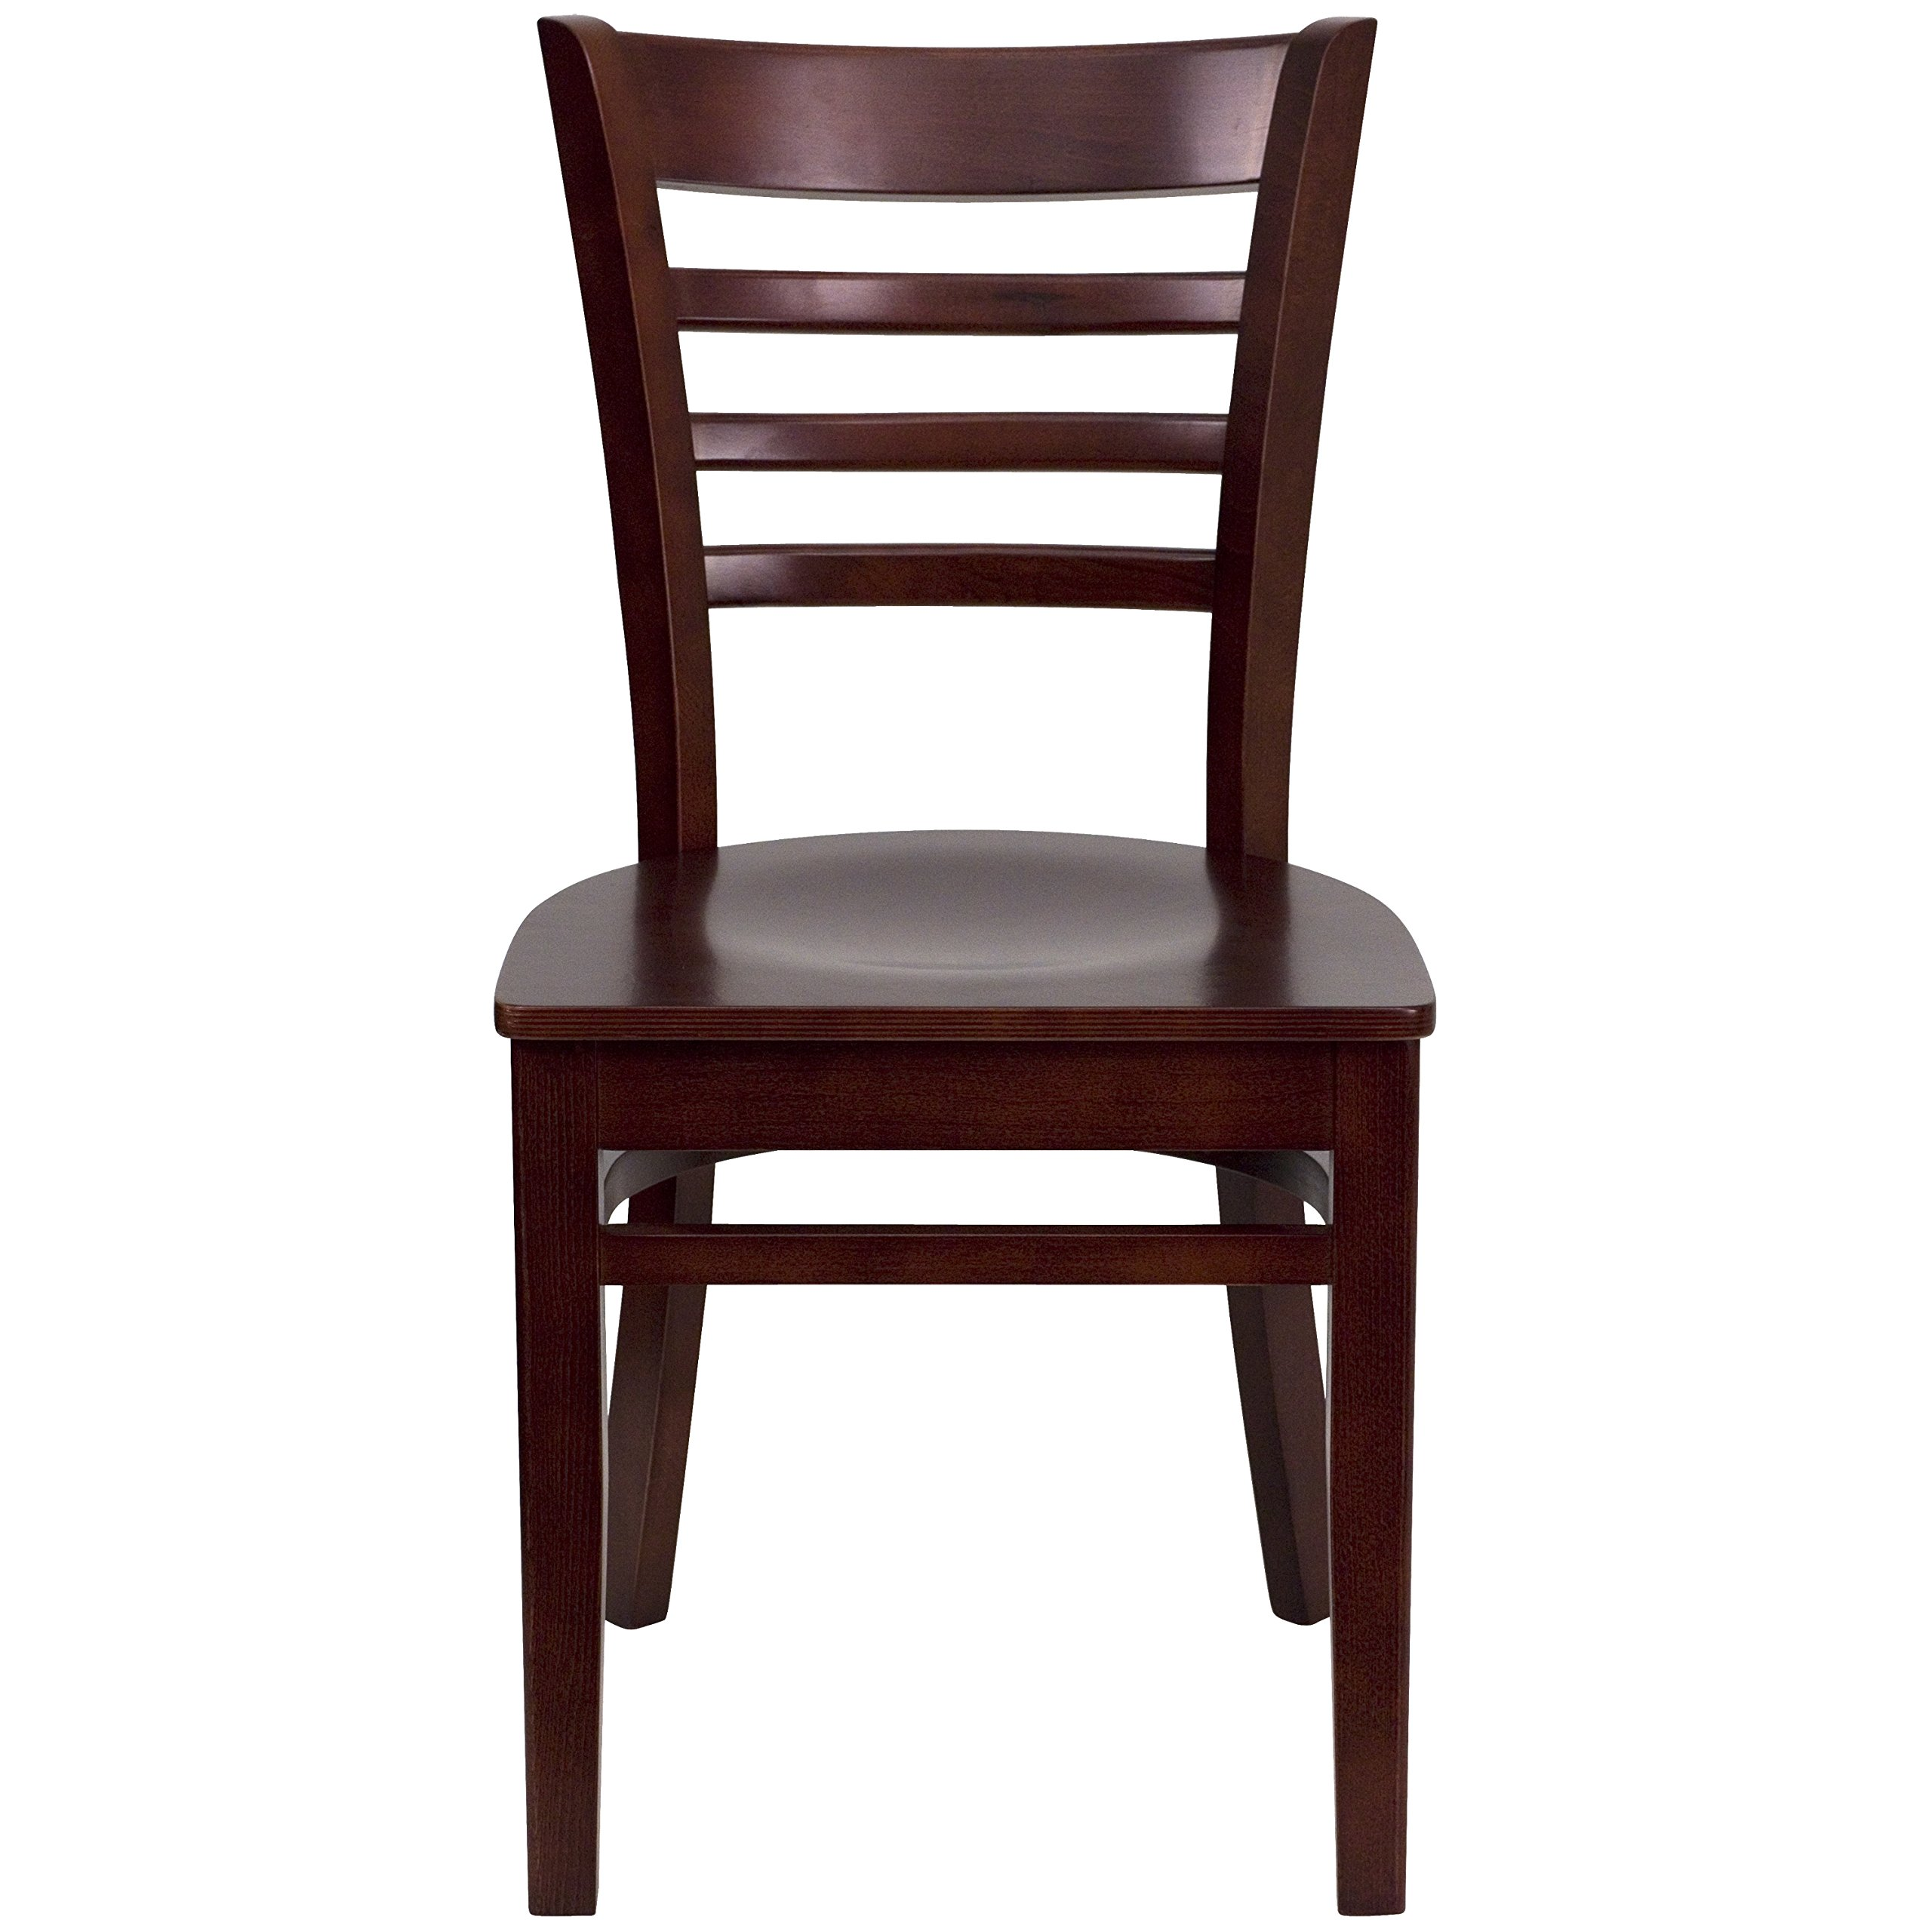 Flash Furniture HERCULES Series Ladder Back Mahogany Wood Restaurant Chair by Flash Furniture (Image #4)